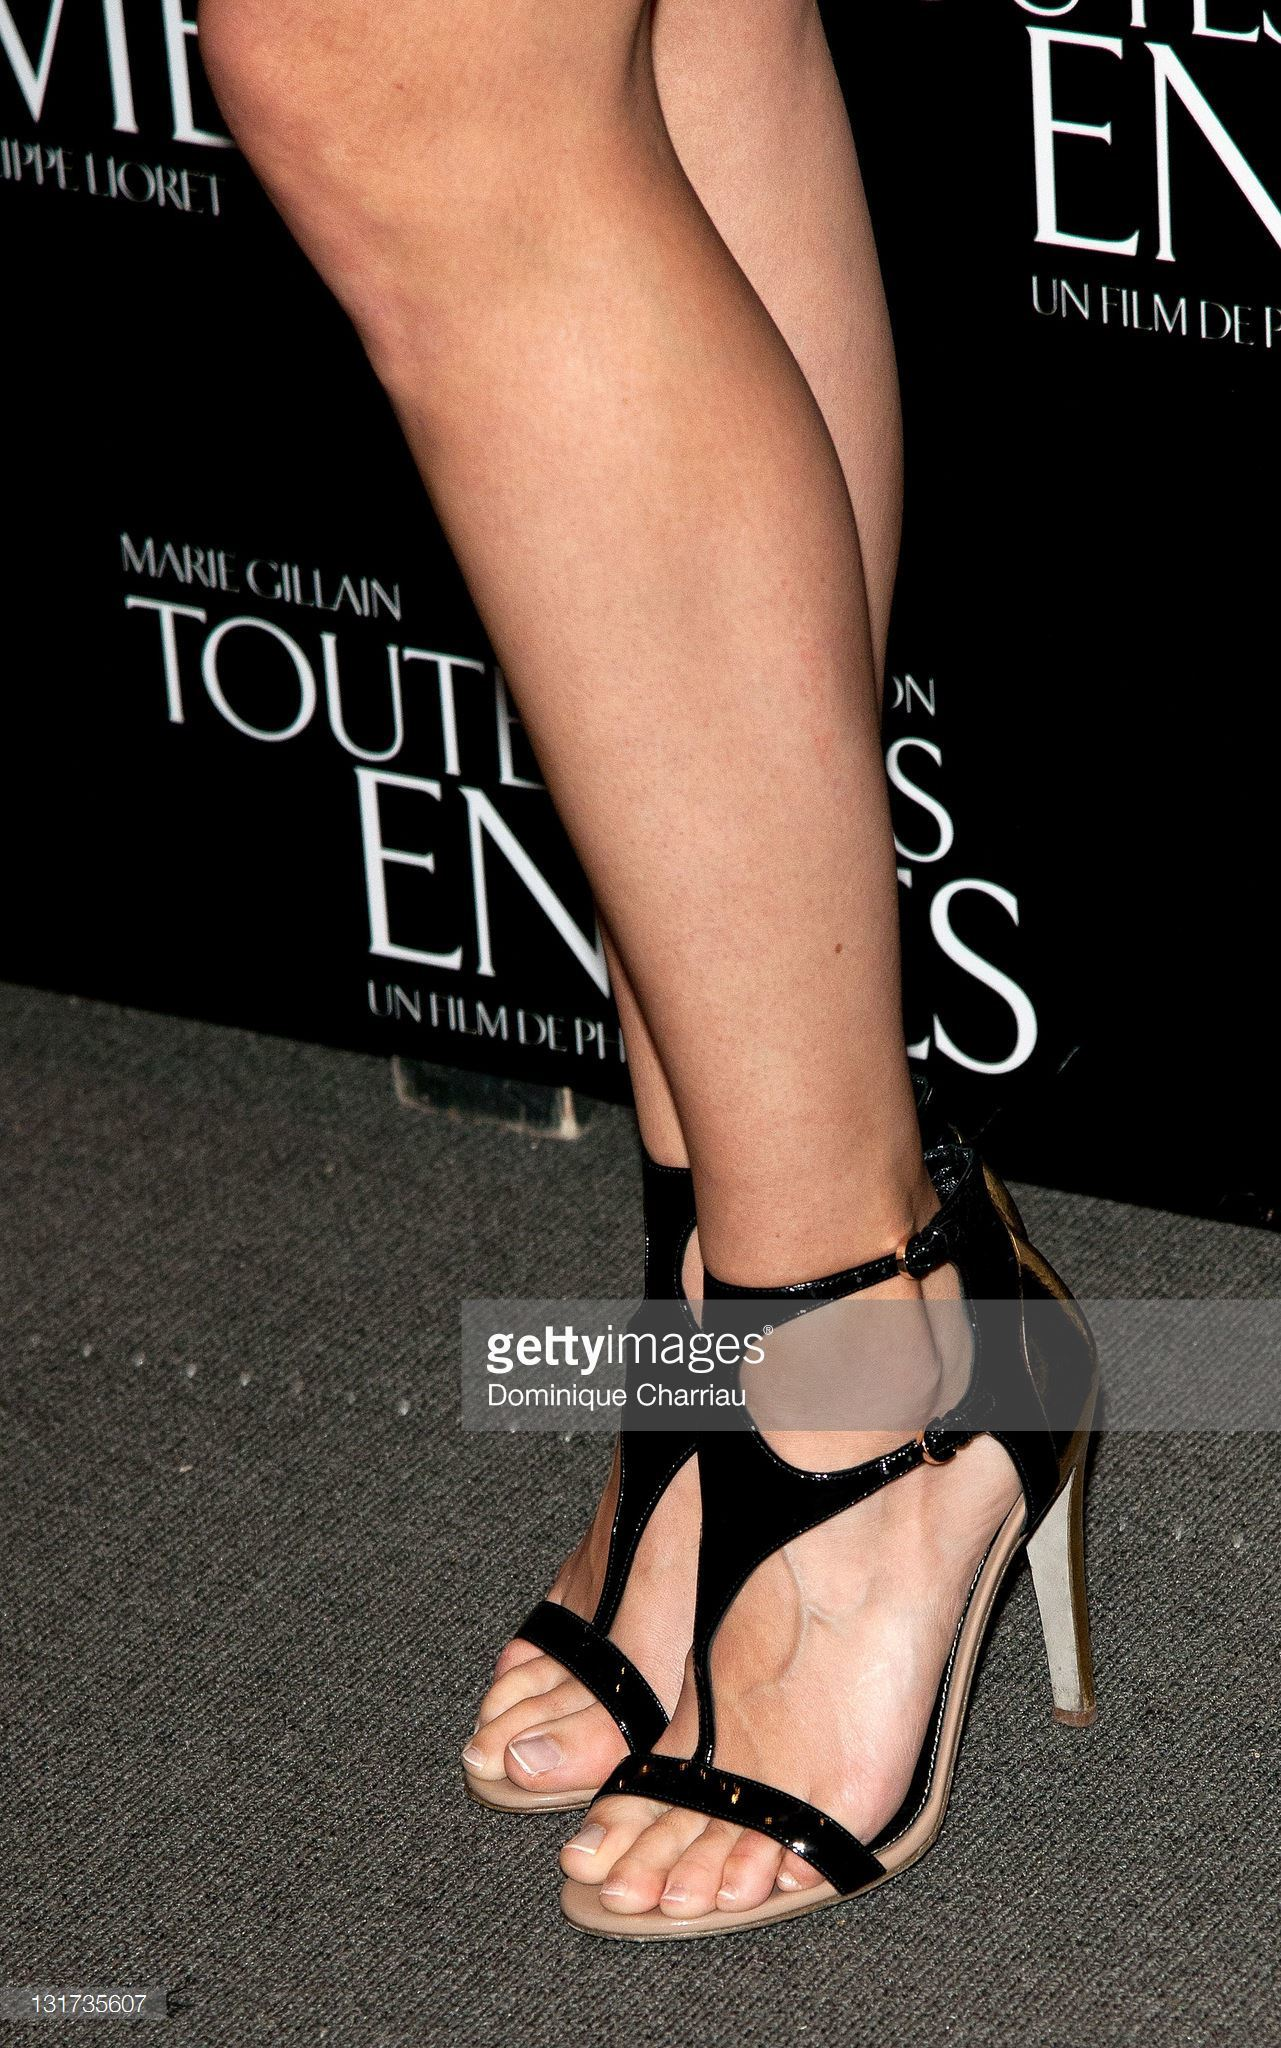 Erotica Legs Marie Gillain  nude (95 images), Twitter, braless